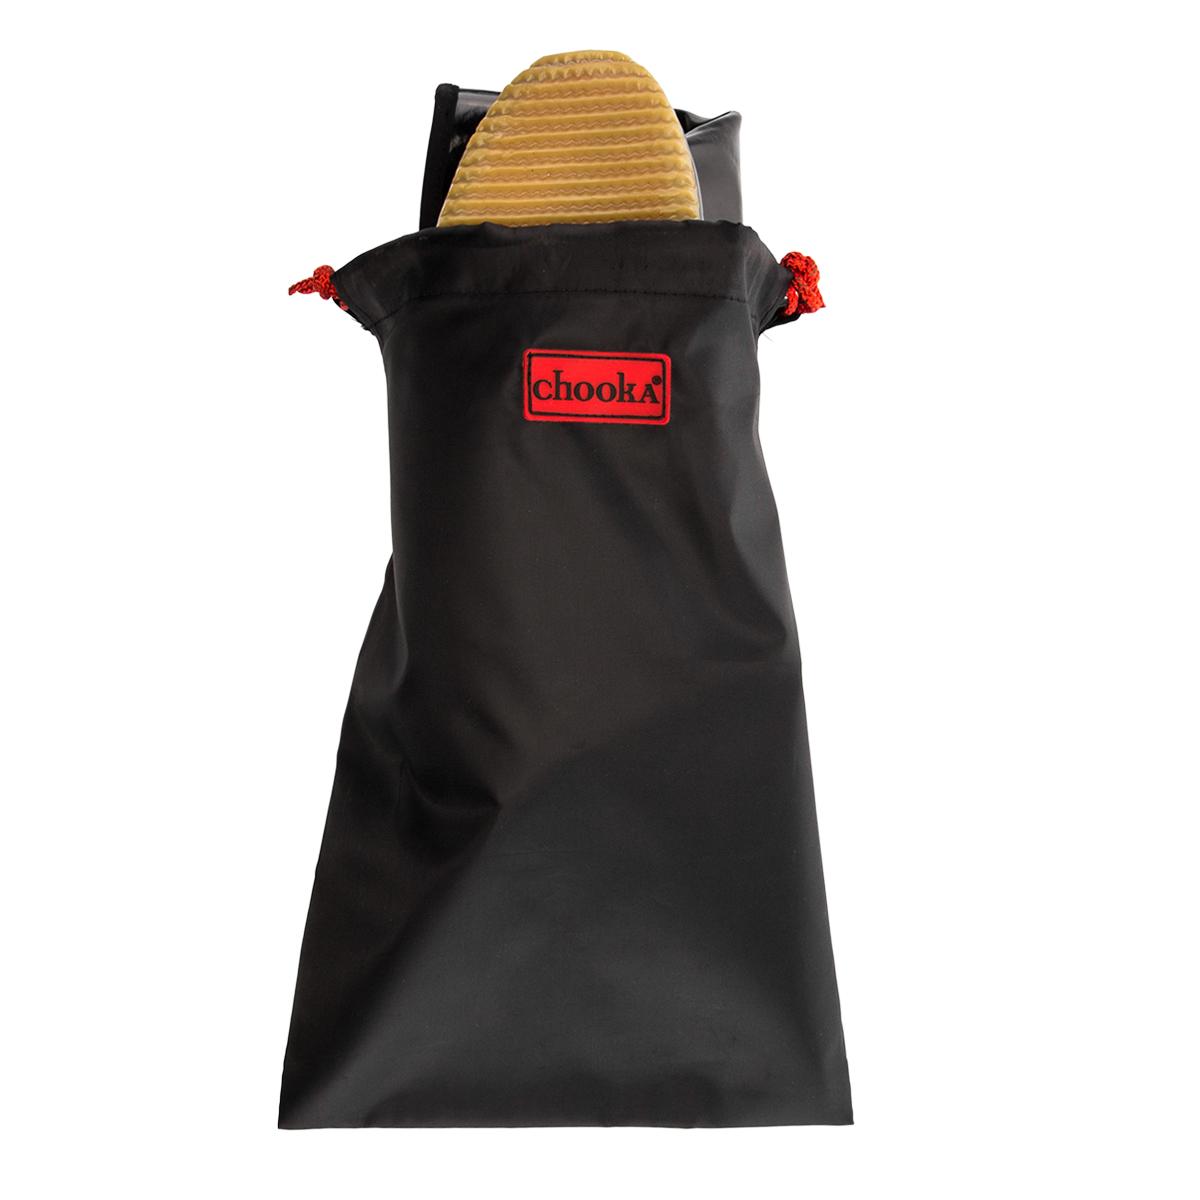 Chooka-Women-039-s-Rubber-Rain-Boots-Mid-Calf-With-Lightweight-Packable-Travel-Bag thumbnail 15